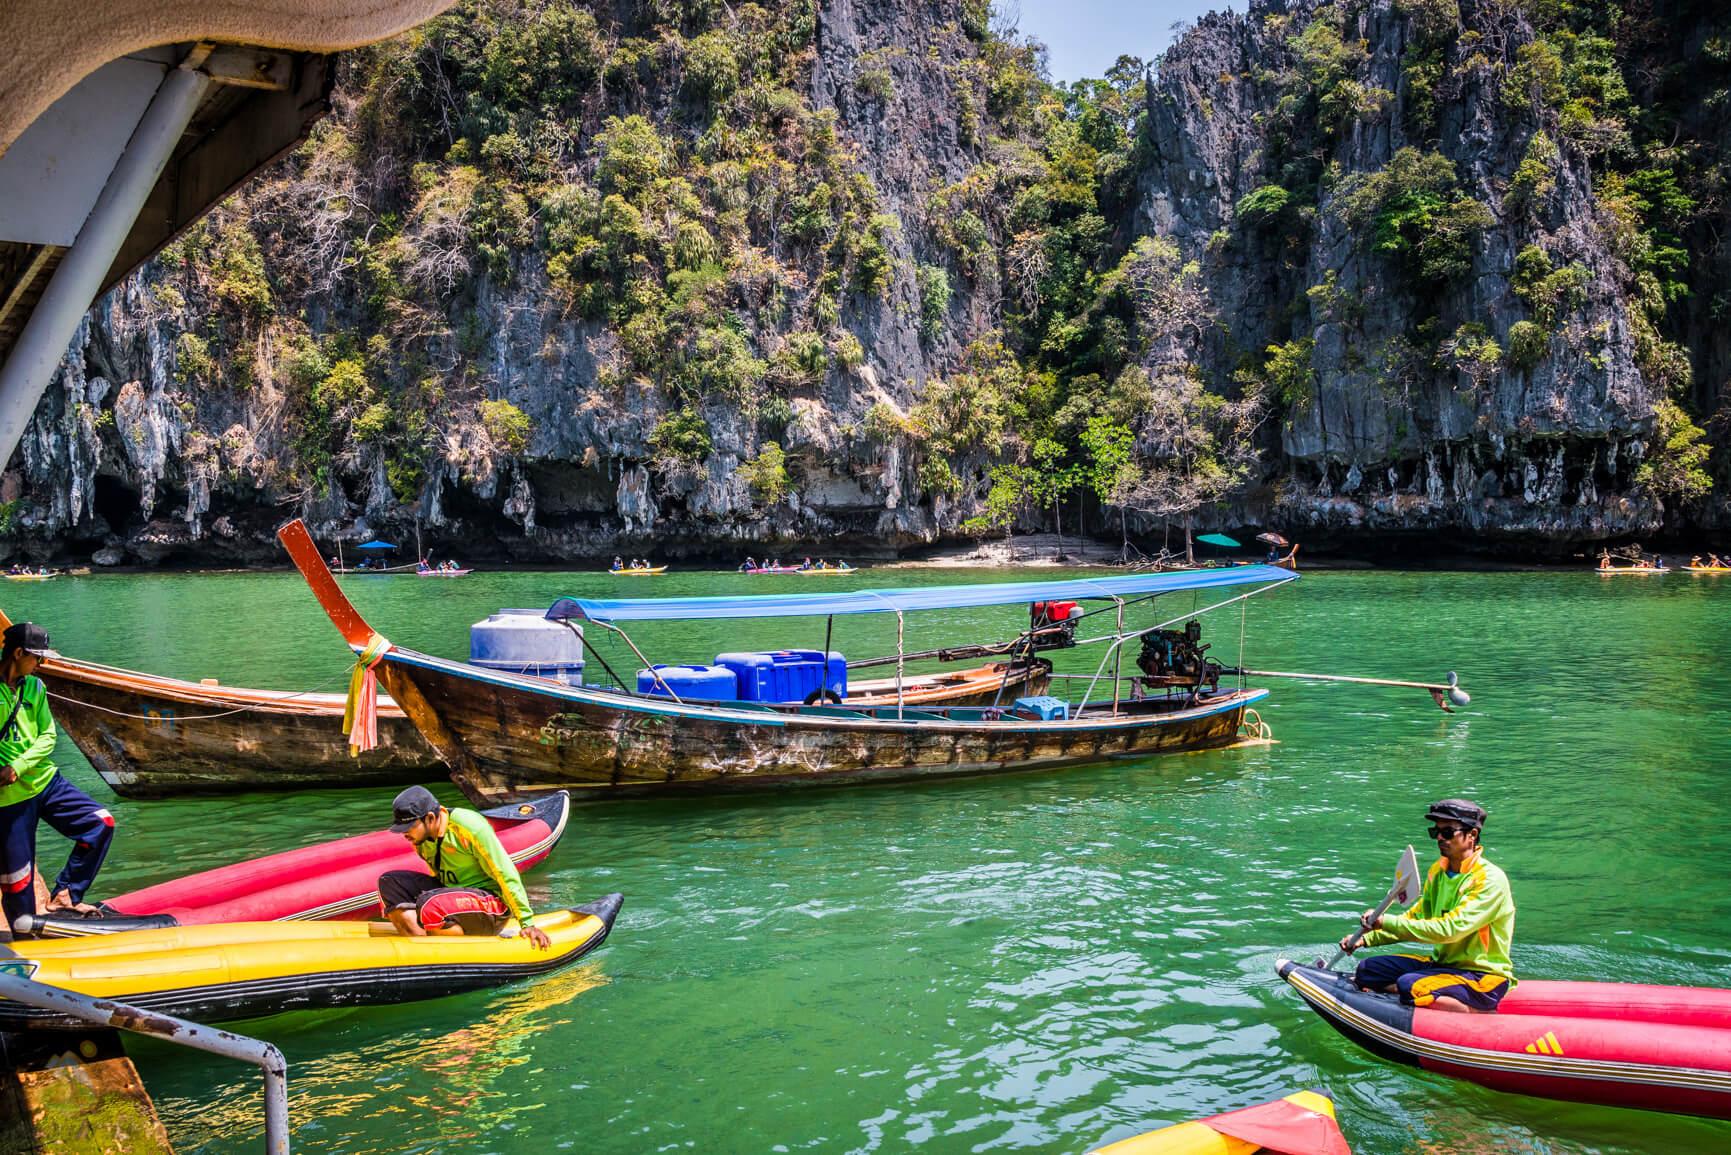 Каноэ в Таиланде, Пханг Нга